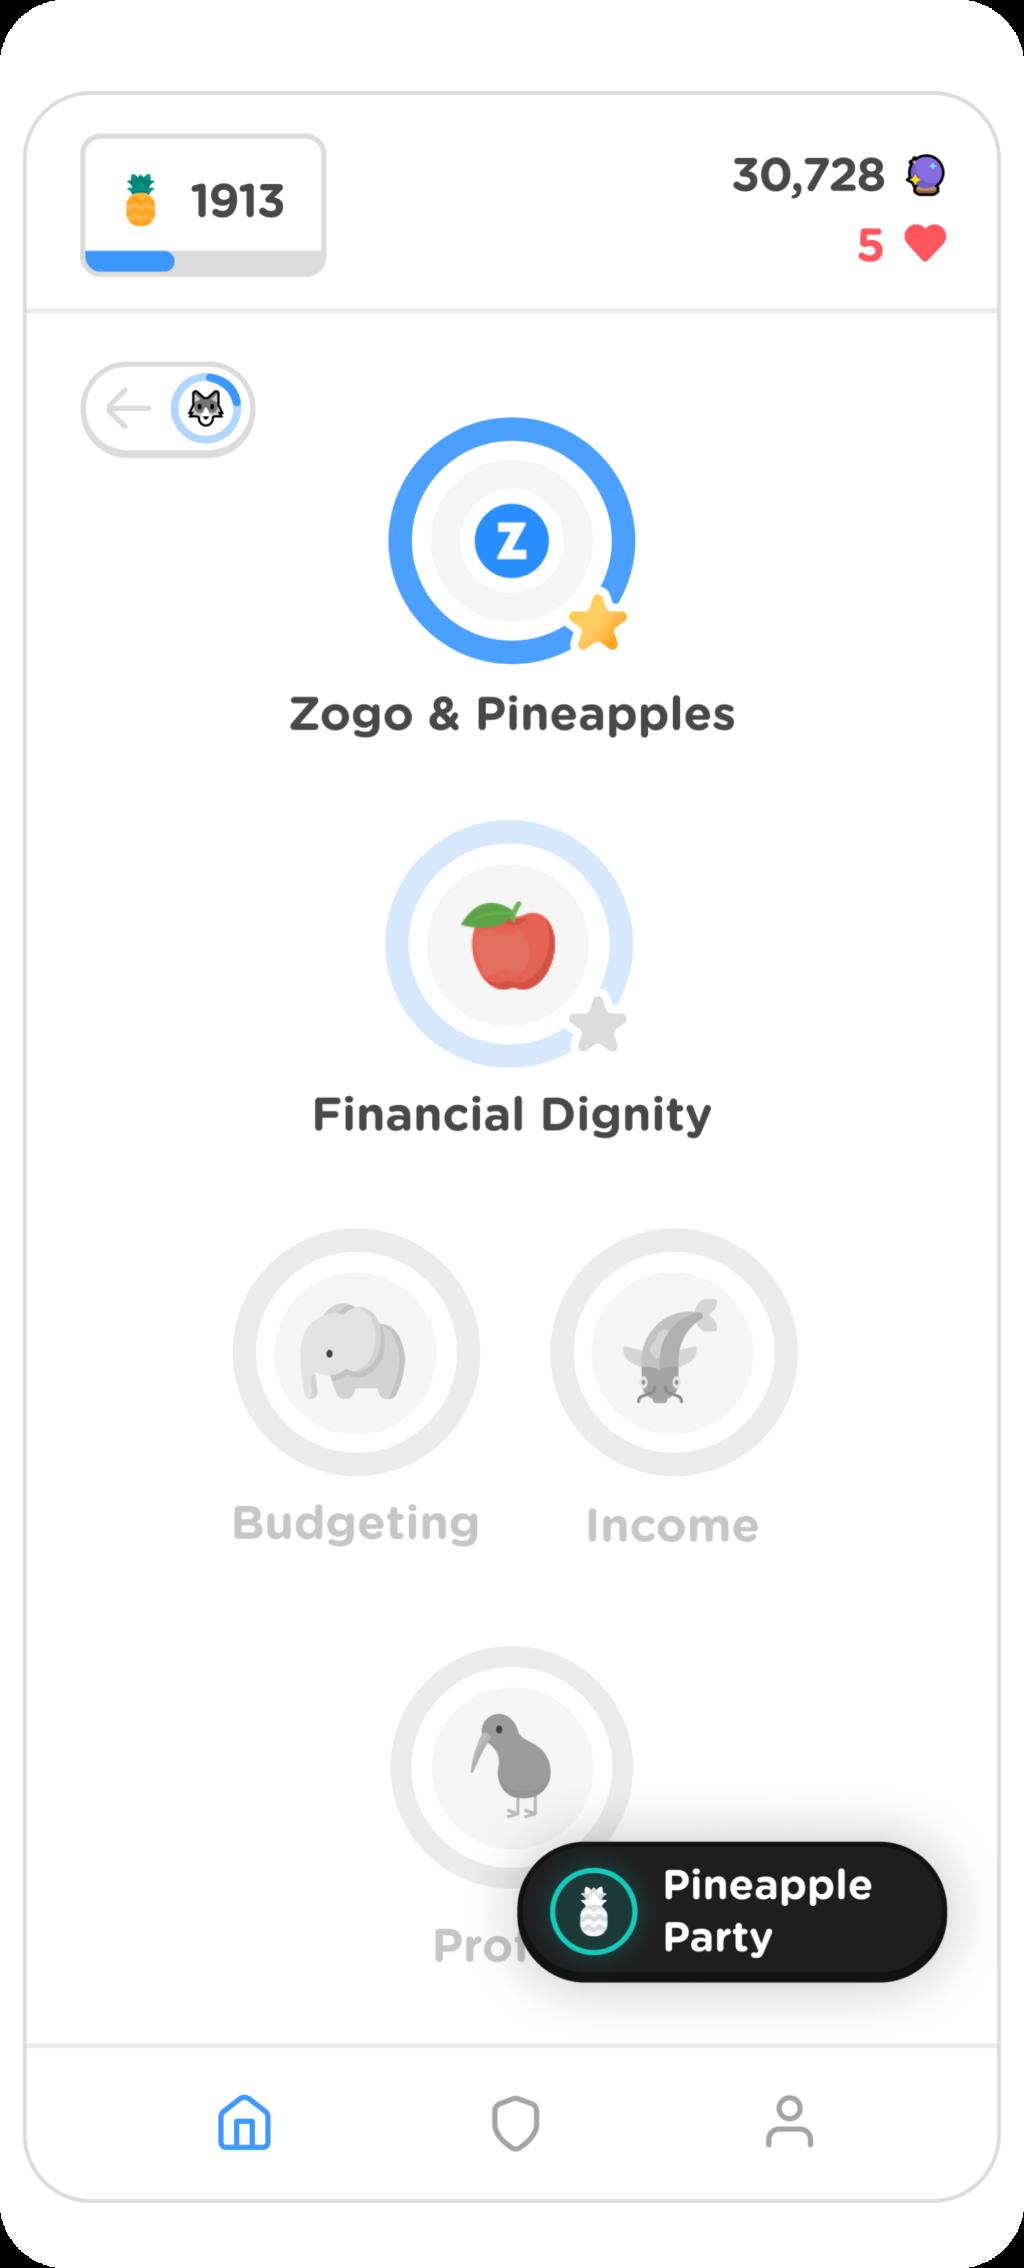 zogo-app-screenshot-homepage